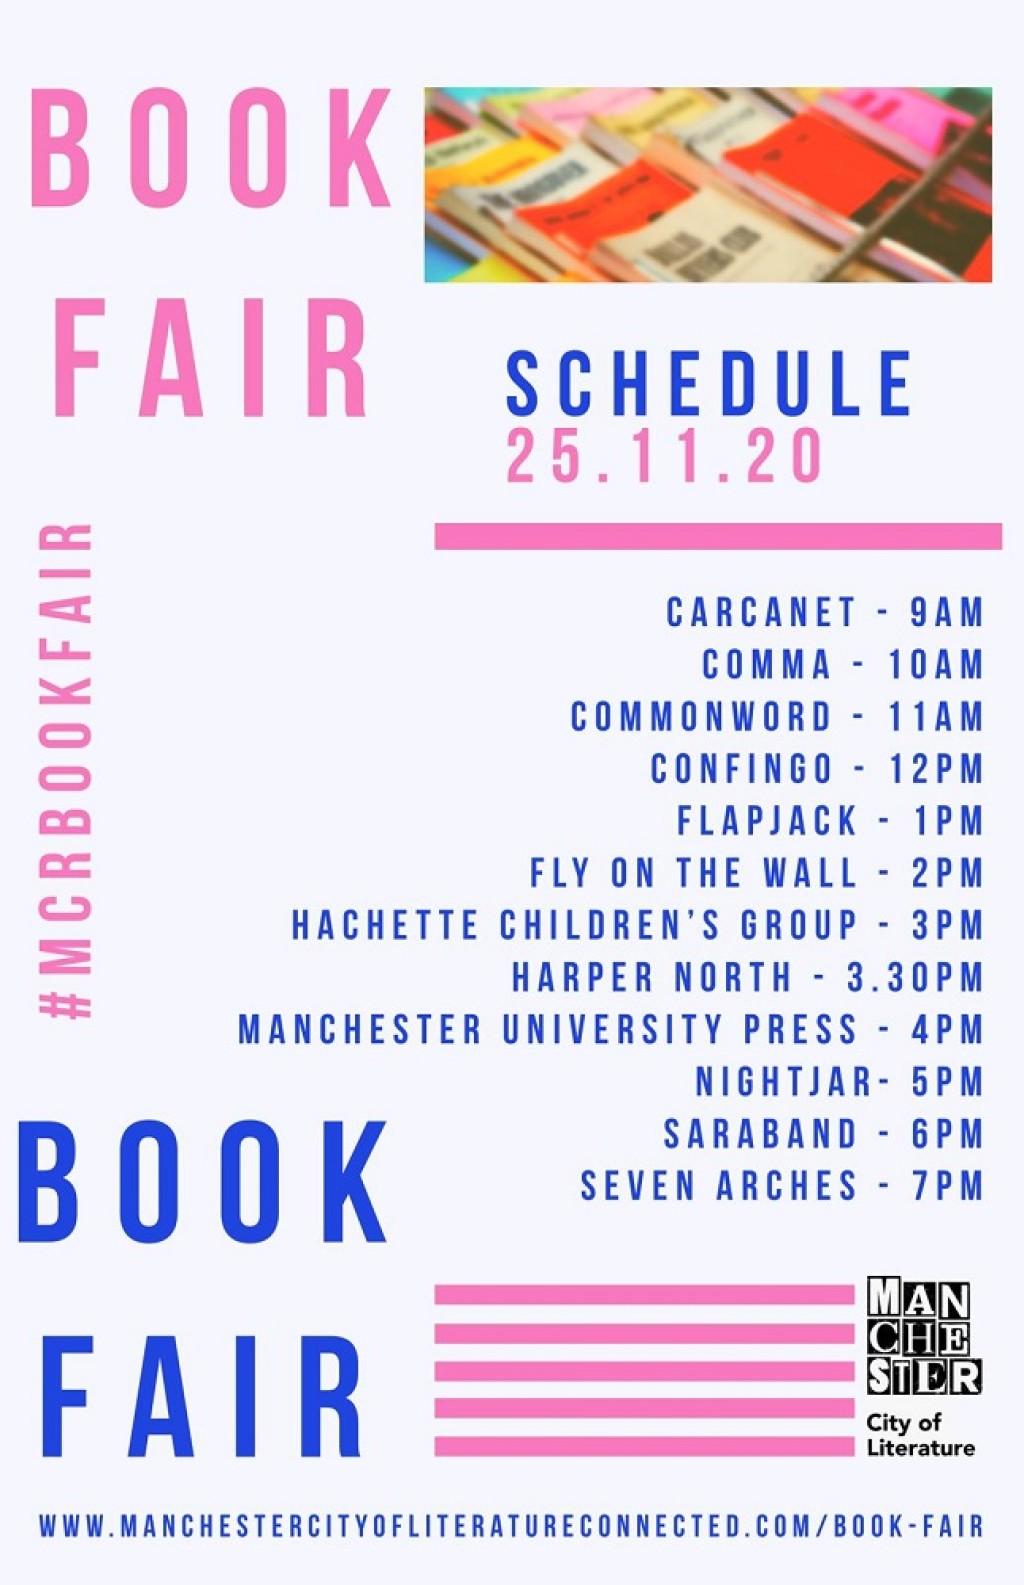 Manchester City of Literature Online Book Fair, November 25th: Flapjack Press @ 1pm